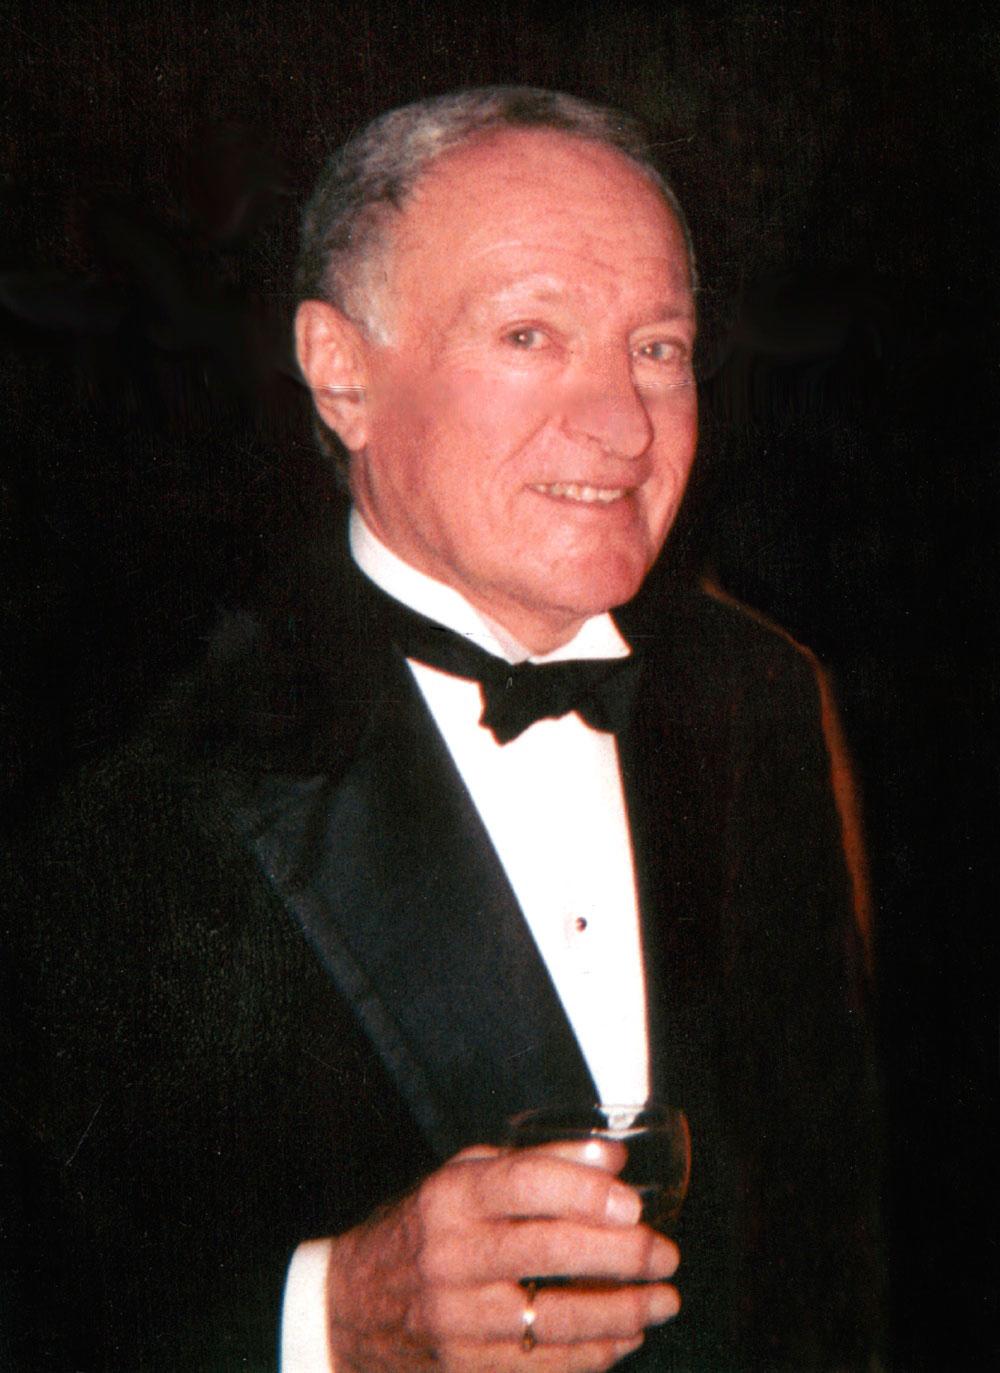 Alfred Hubay (1925 - 2018)